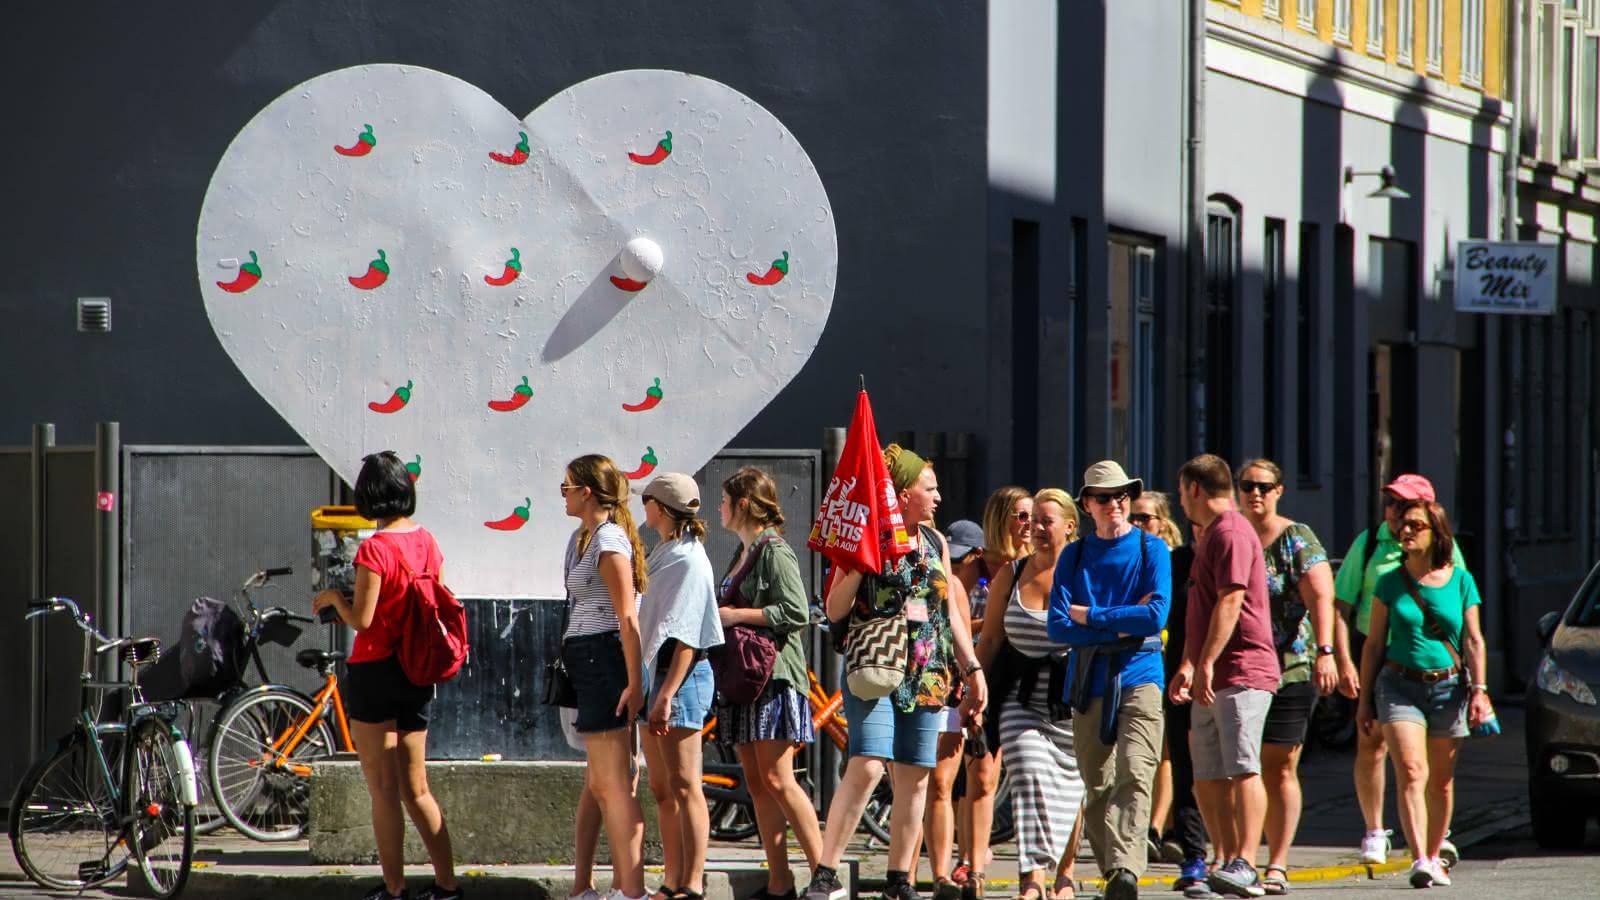 SANDEMANs Copenhagen Alternative Tour group crossing the street